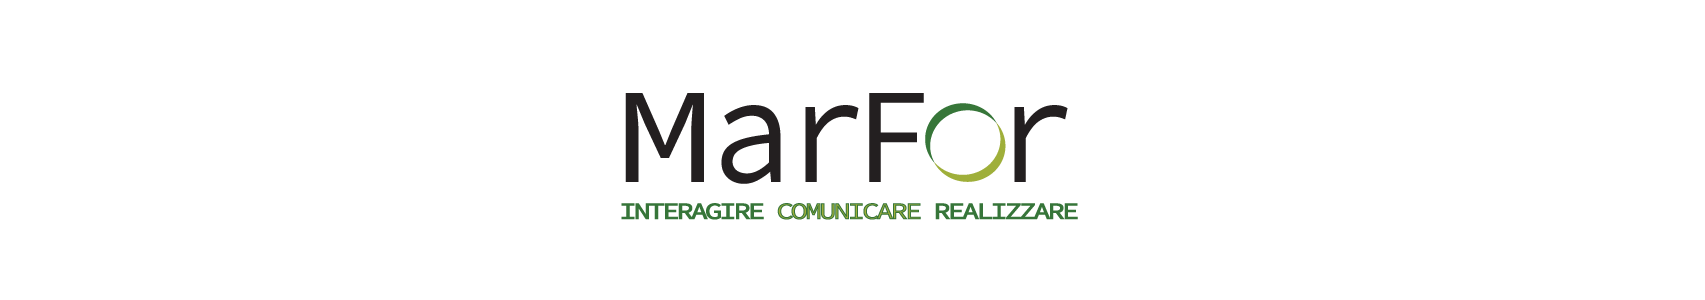 MarFor